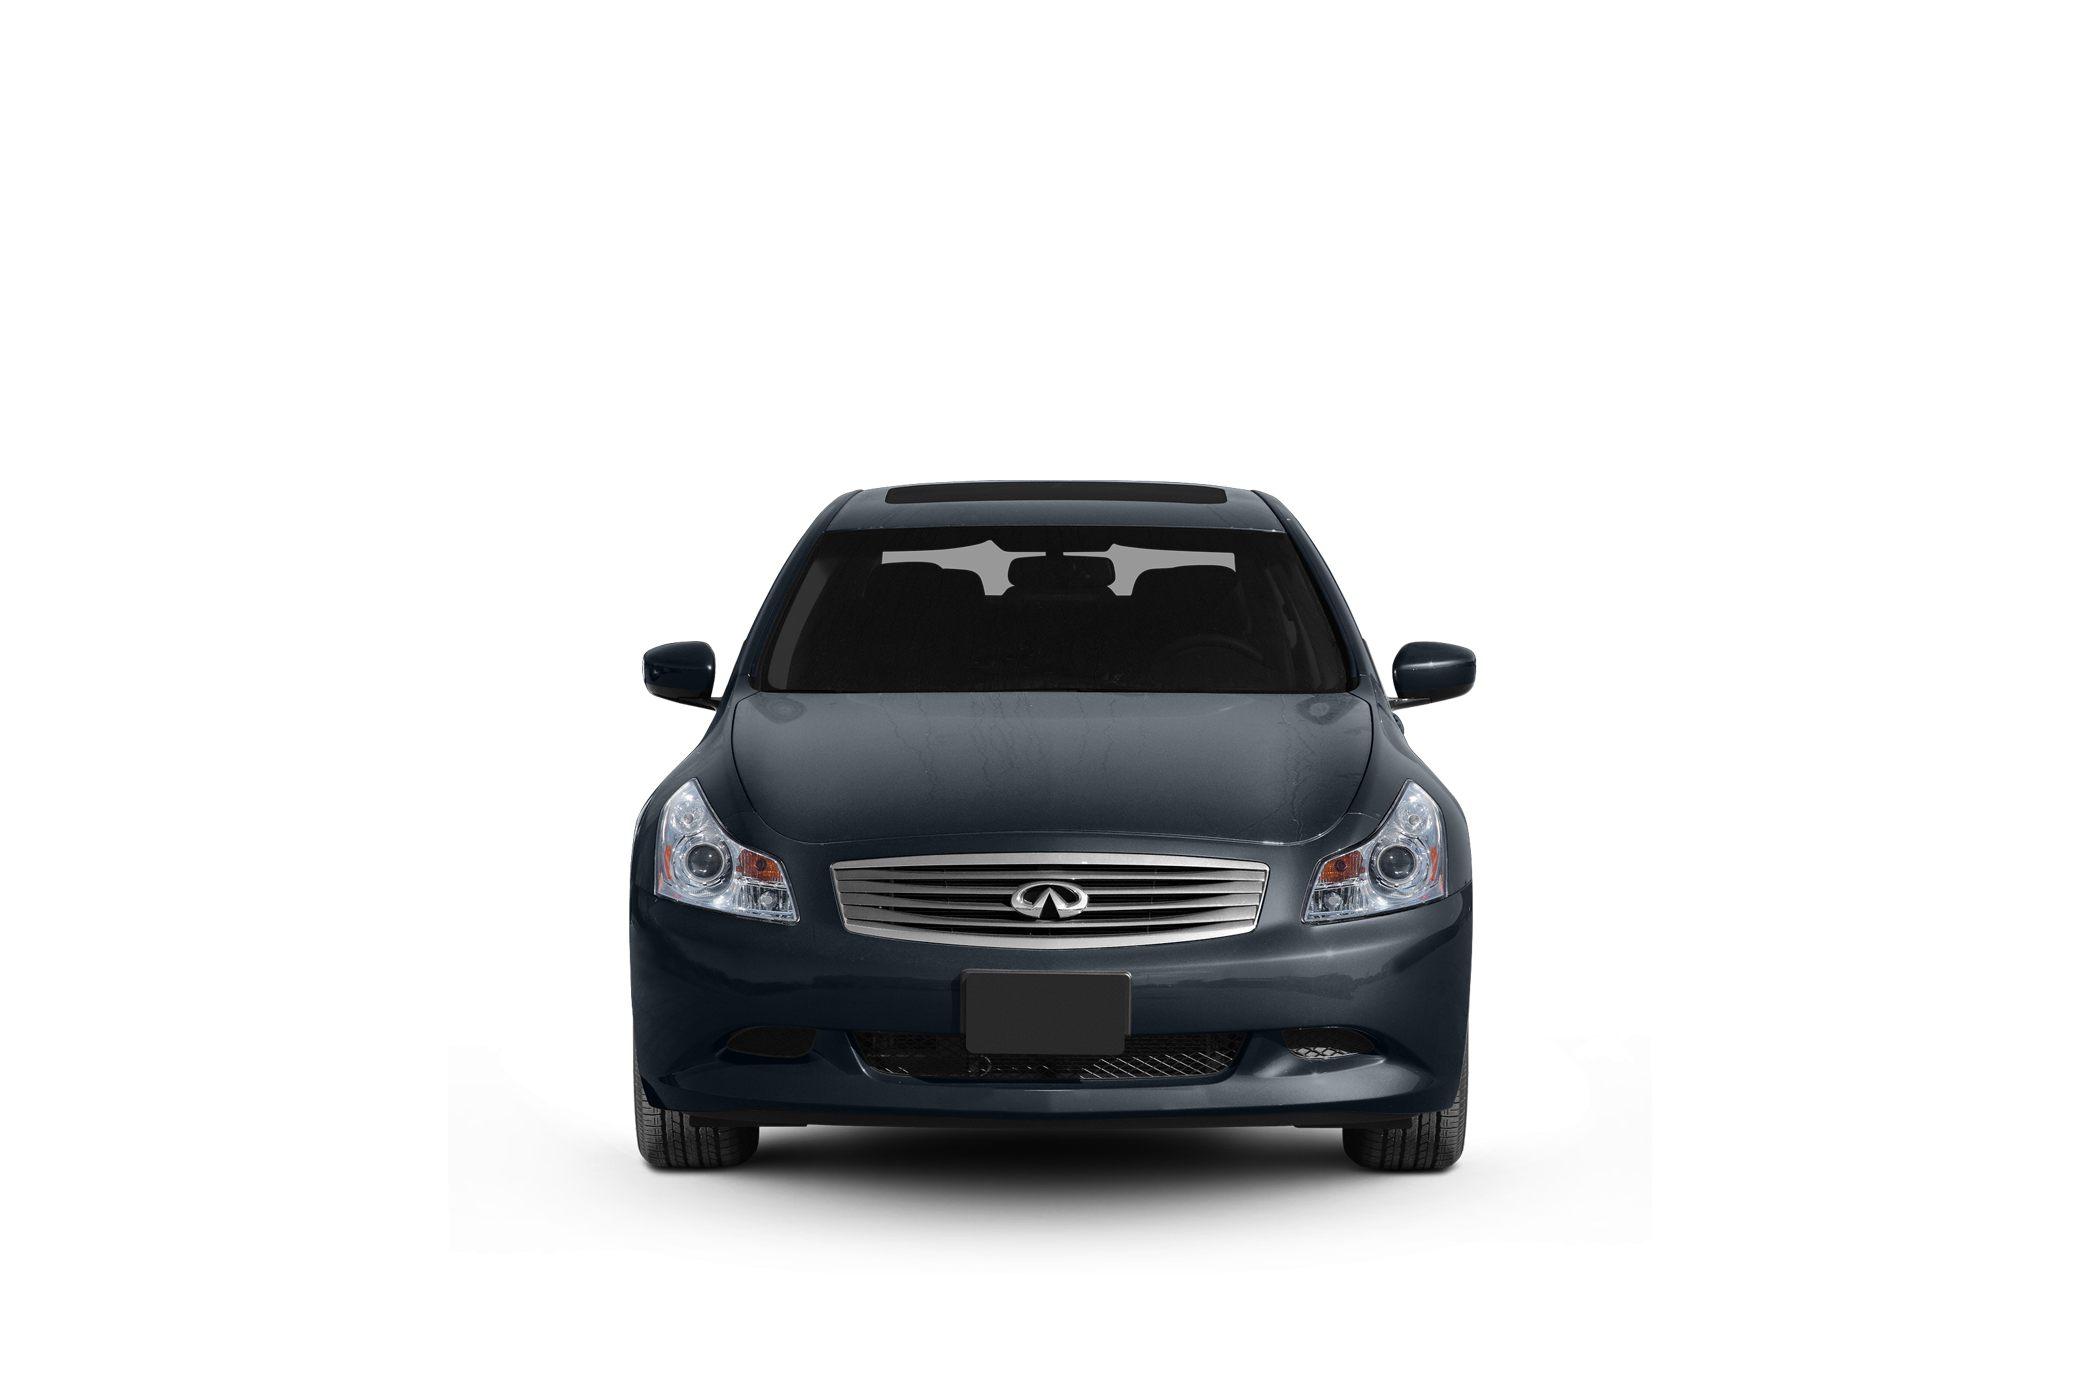 2009 Infiniti G37x Sedan Specs Safety Rating Amp Mpg